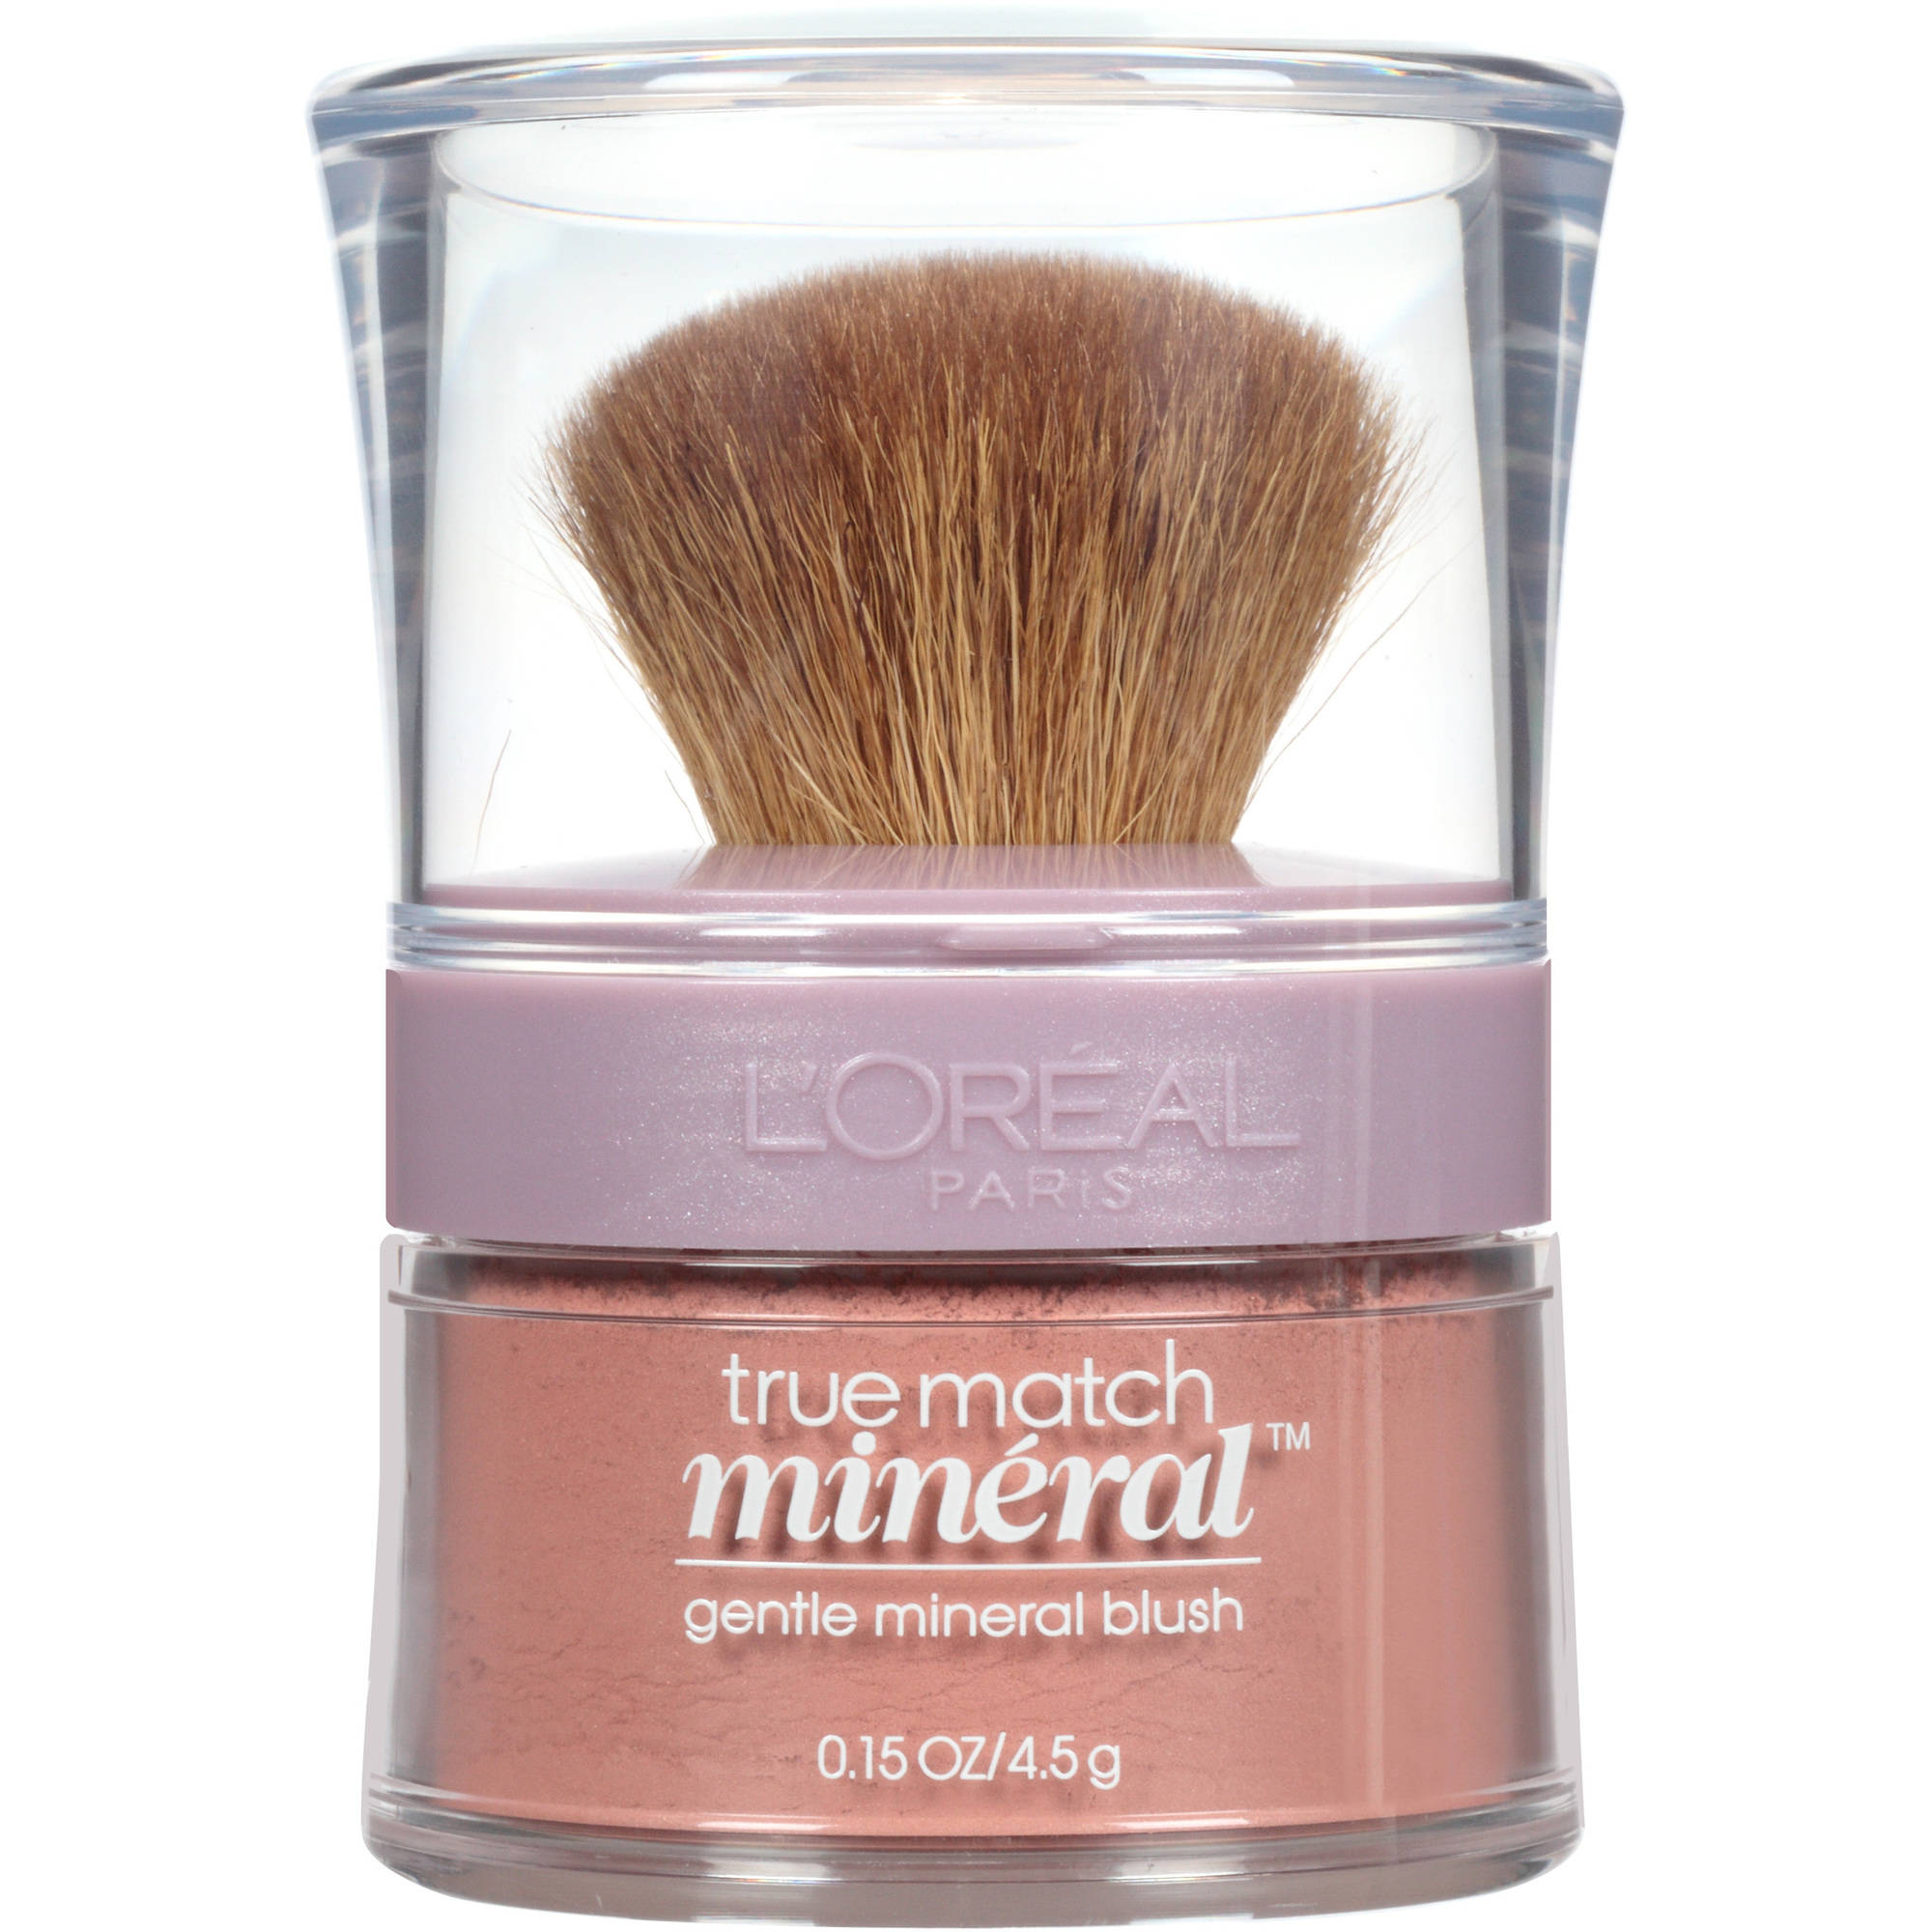 L'Oreal Paris True Match Naturale Mineral Blush